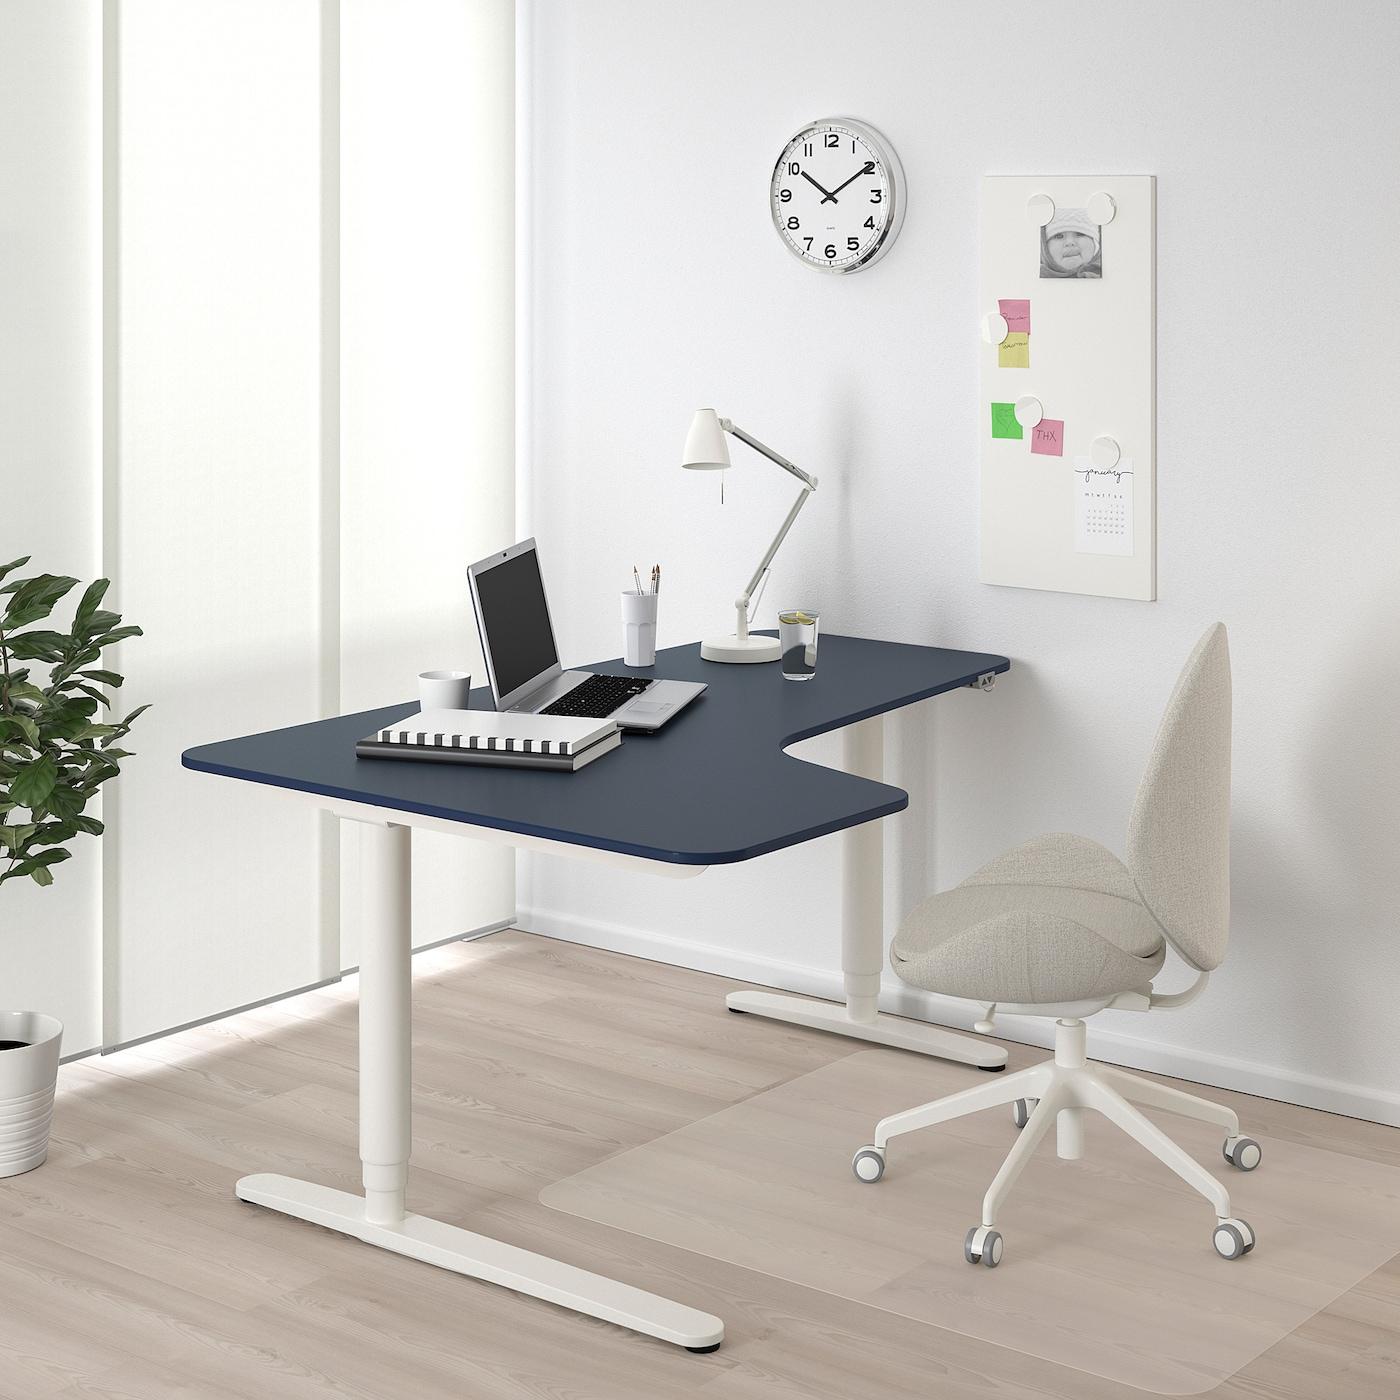 BEKANT Corner desk left sit/stand, linoleum blue/white, 160x110 cm